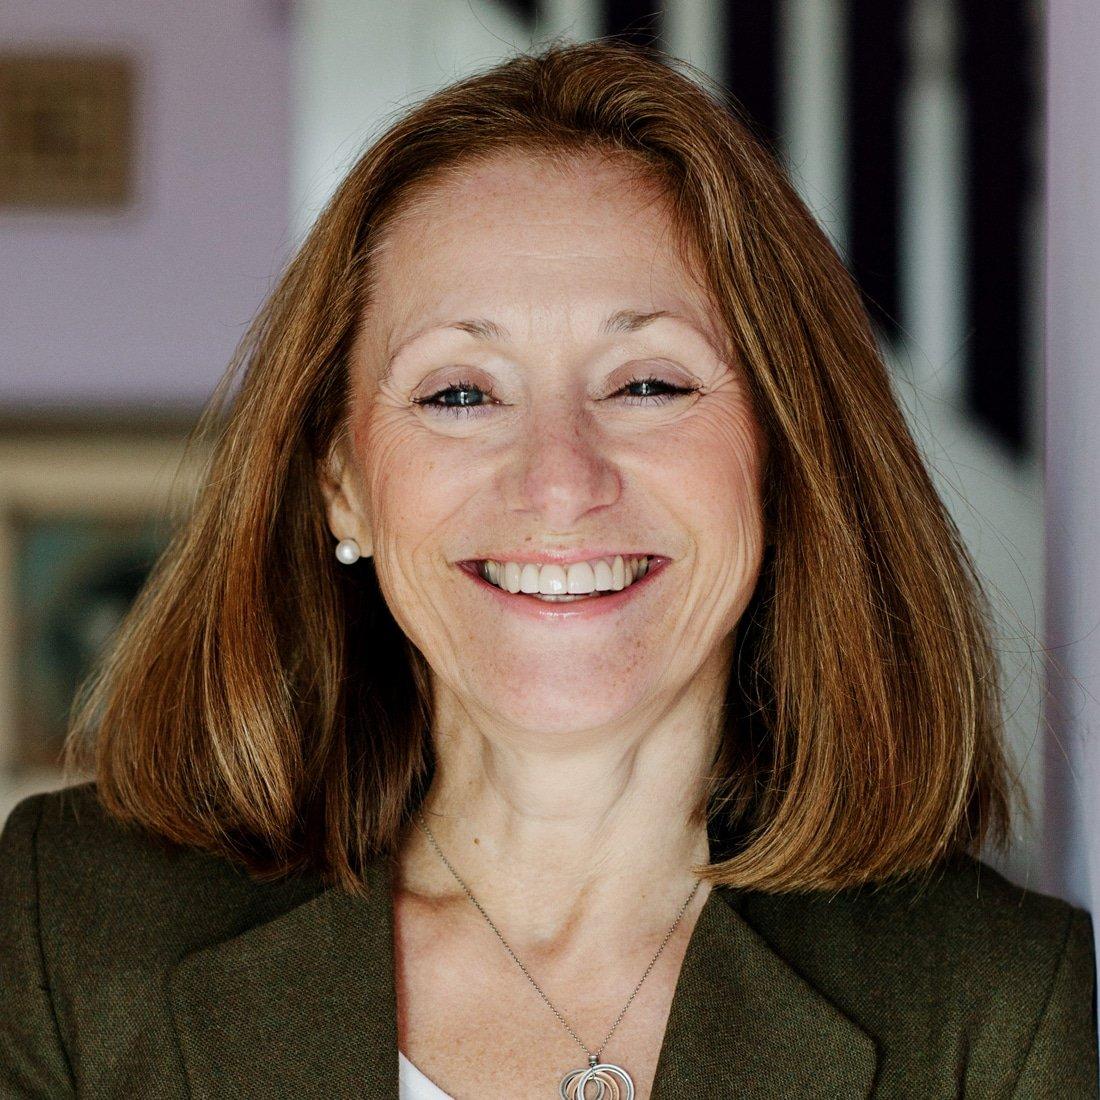 Dr-Lynda-Shaw-neuroscientist-psychologist-entrepreneur-speaker-at-Great-British-Speakers